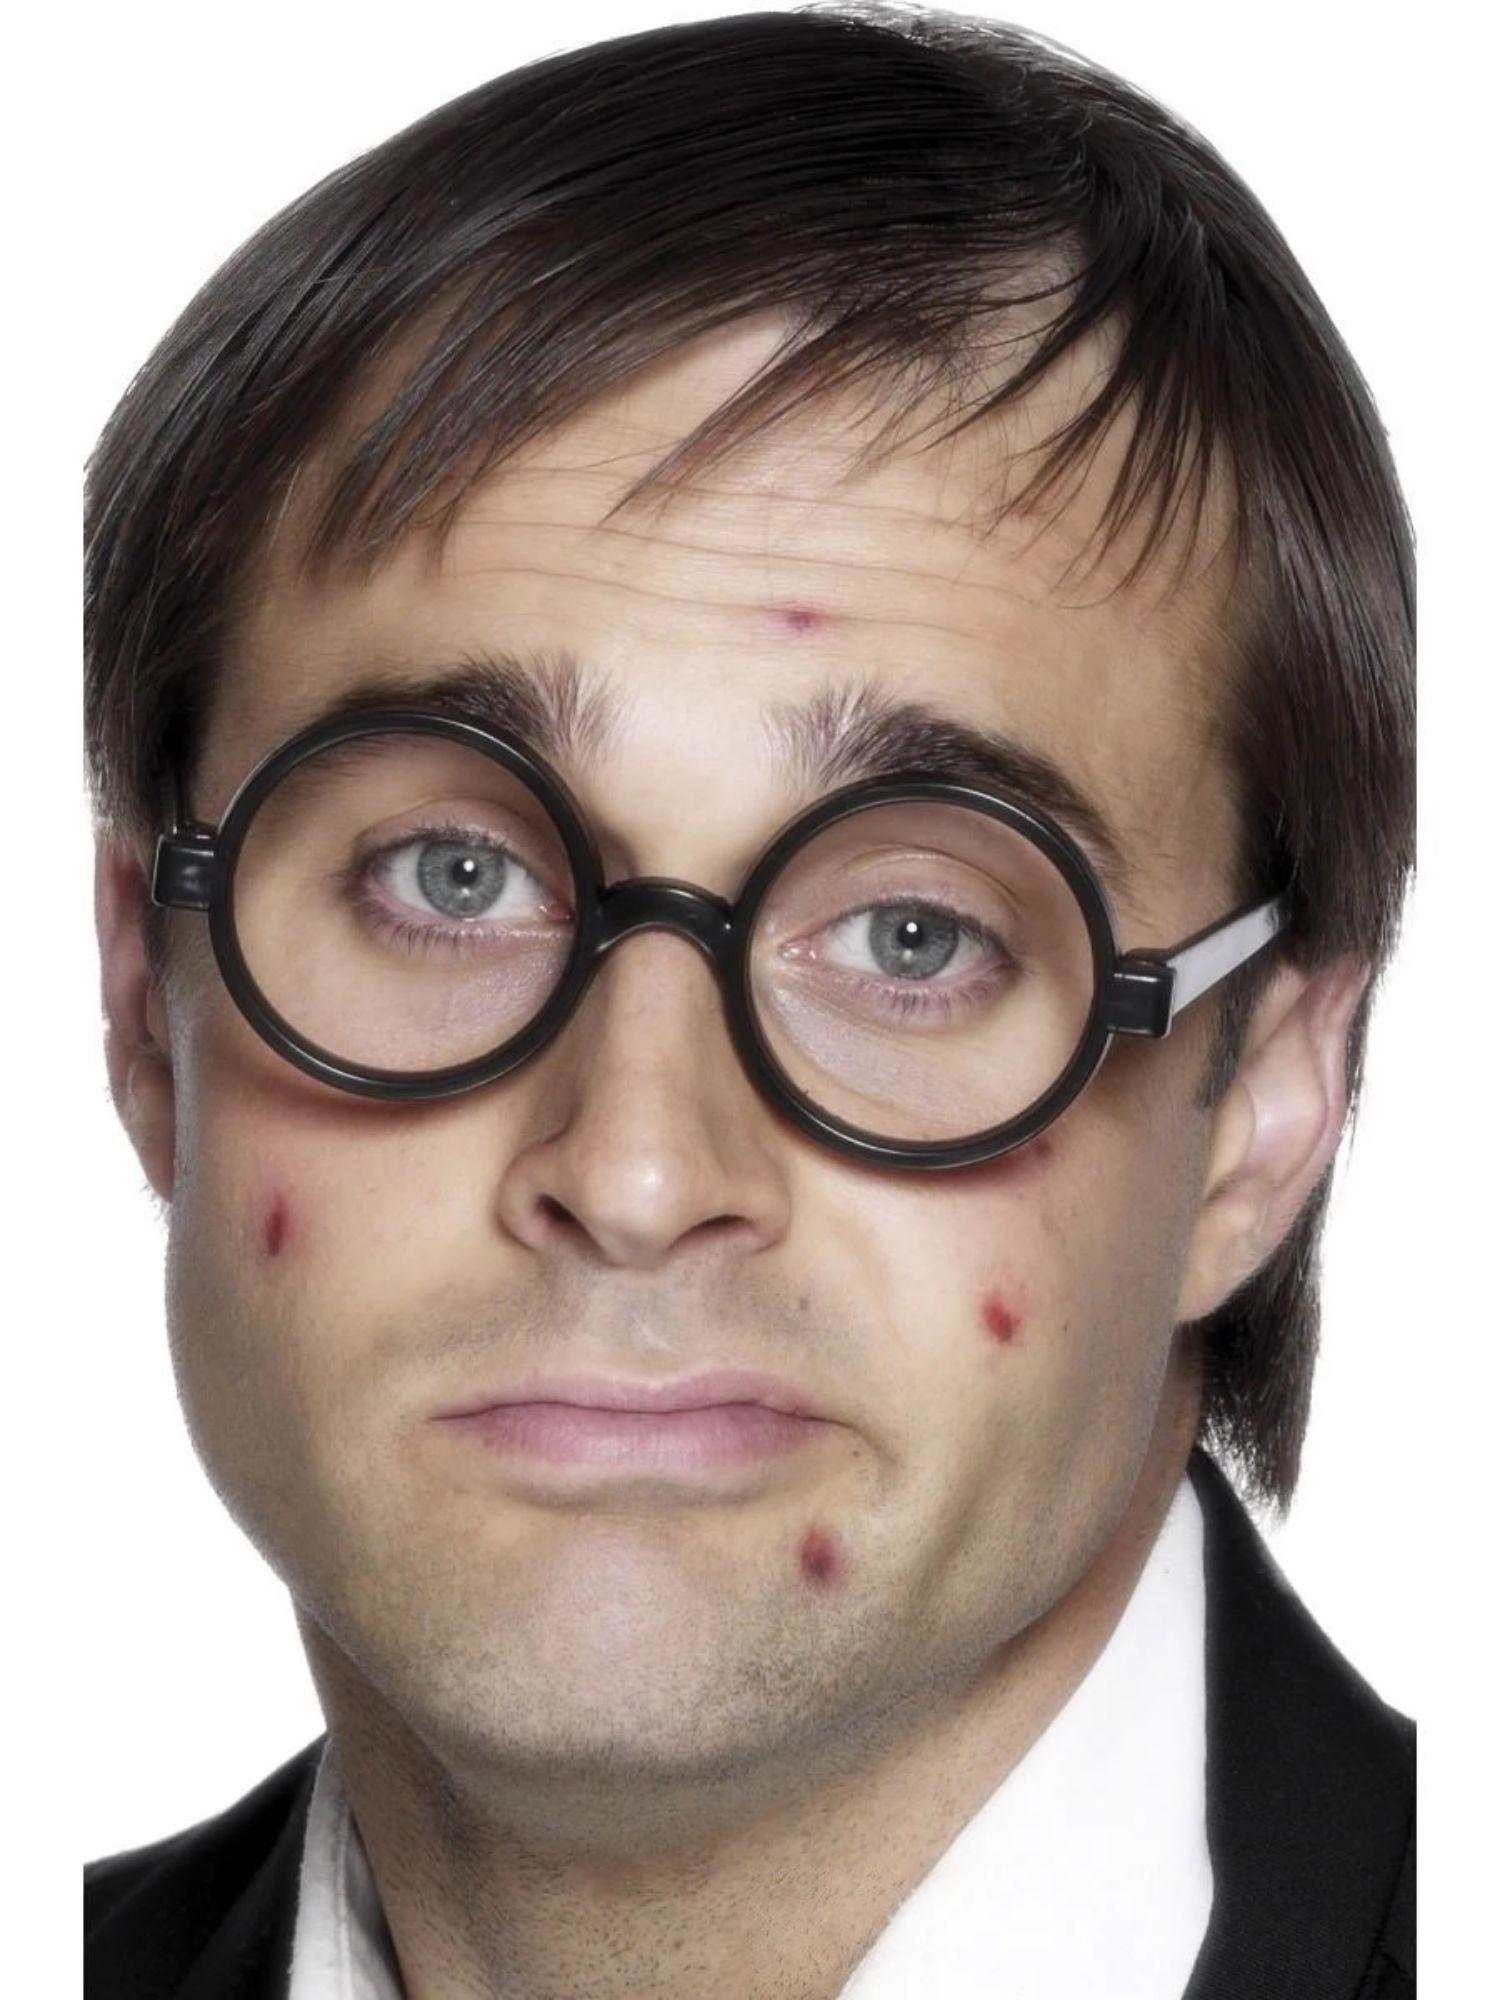 Harry Potter Glasses Costume Eyewear Children Halloween Movie Accessory